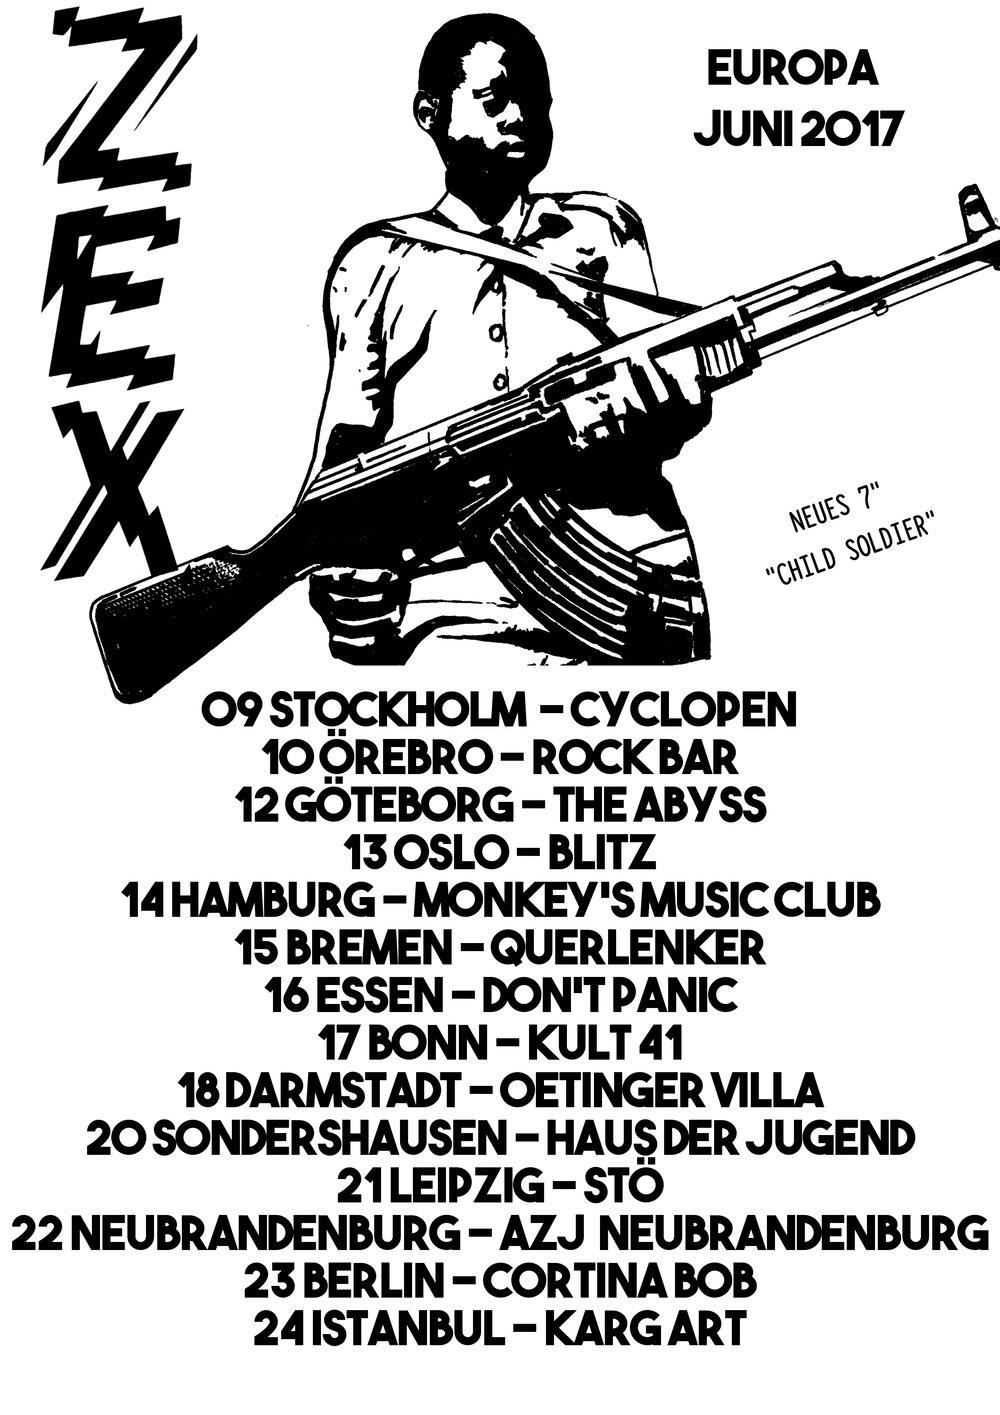 flyer-17.06.08-EUROTOUR01.jpg